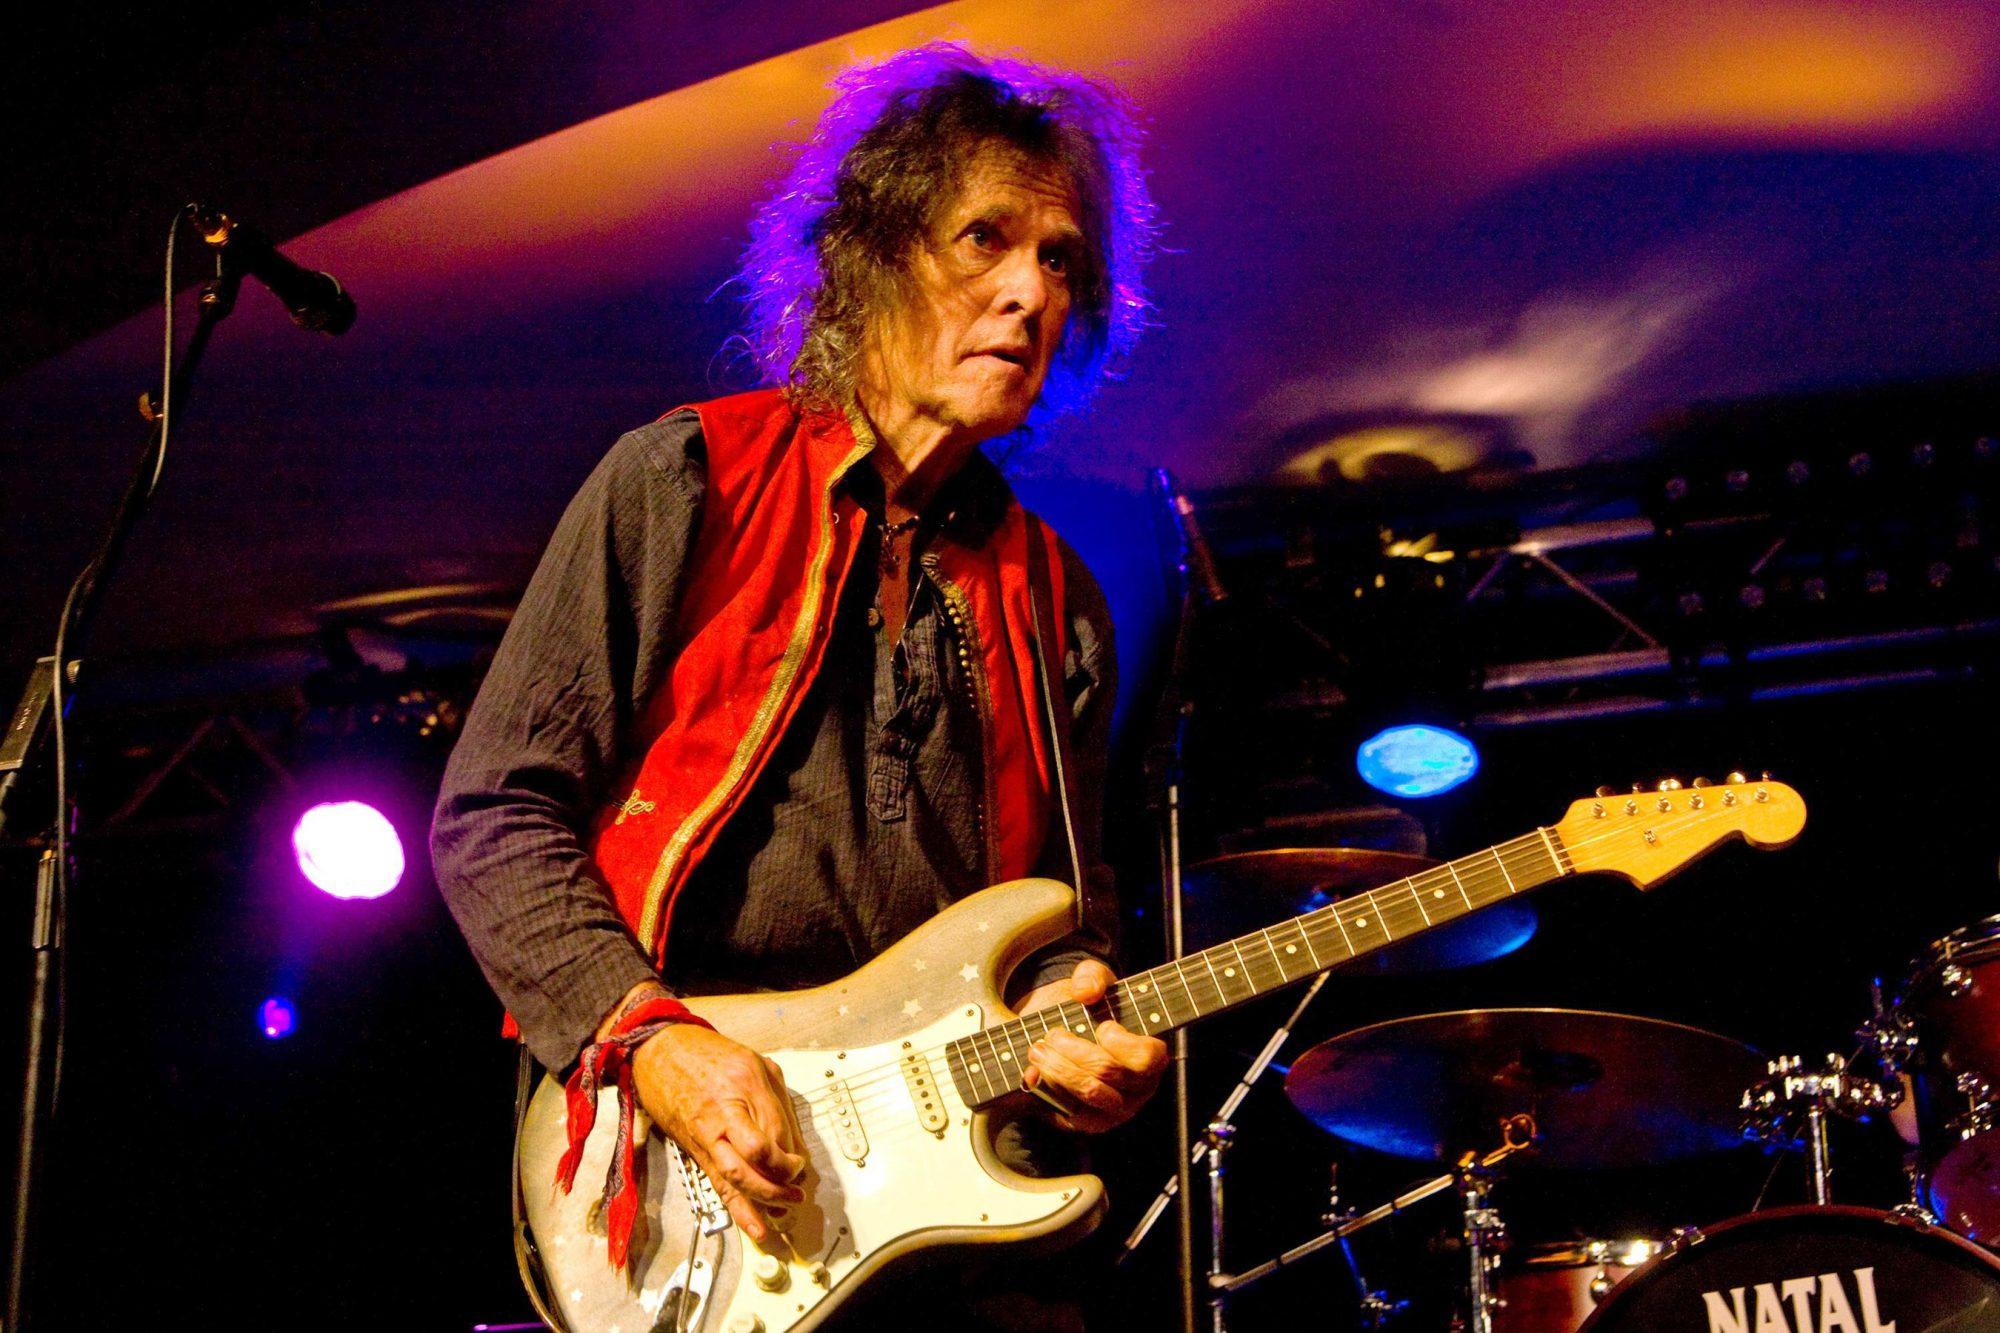 Bernie Torme in concert at Hard Rock Hell, Wales, Britain - 28 Nov 2013